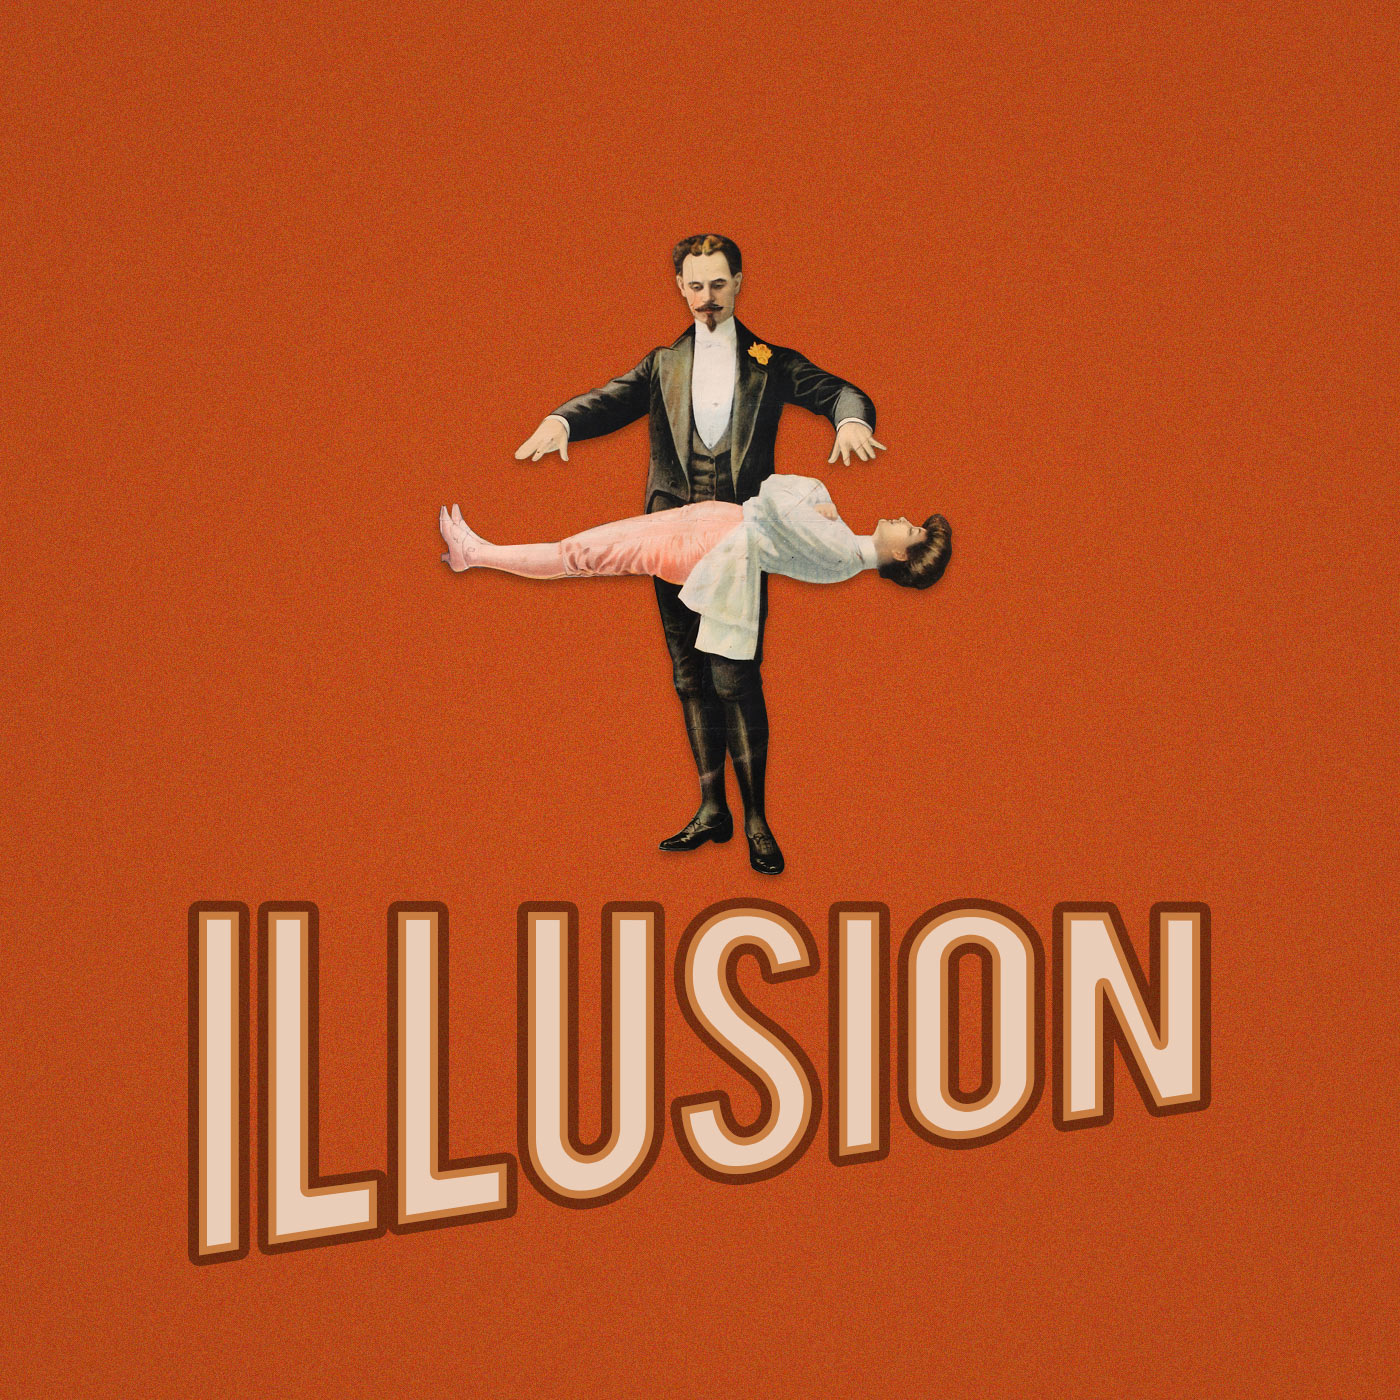 illusion-art - Illusion Podcast.jpg